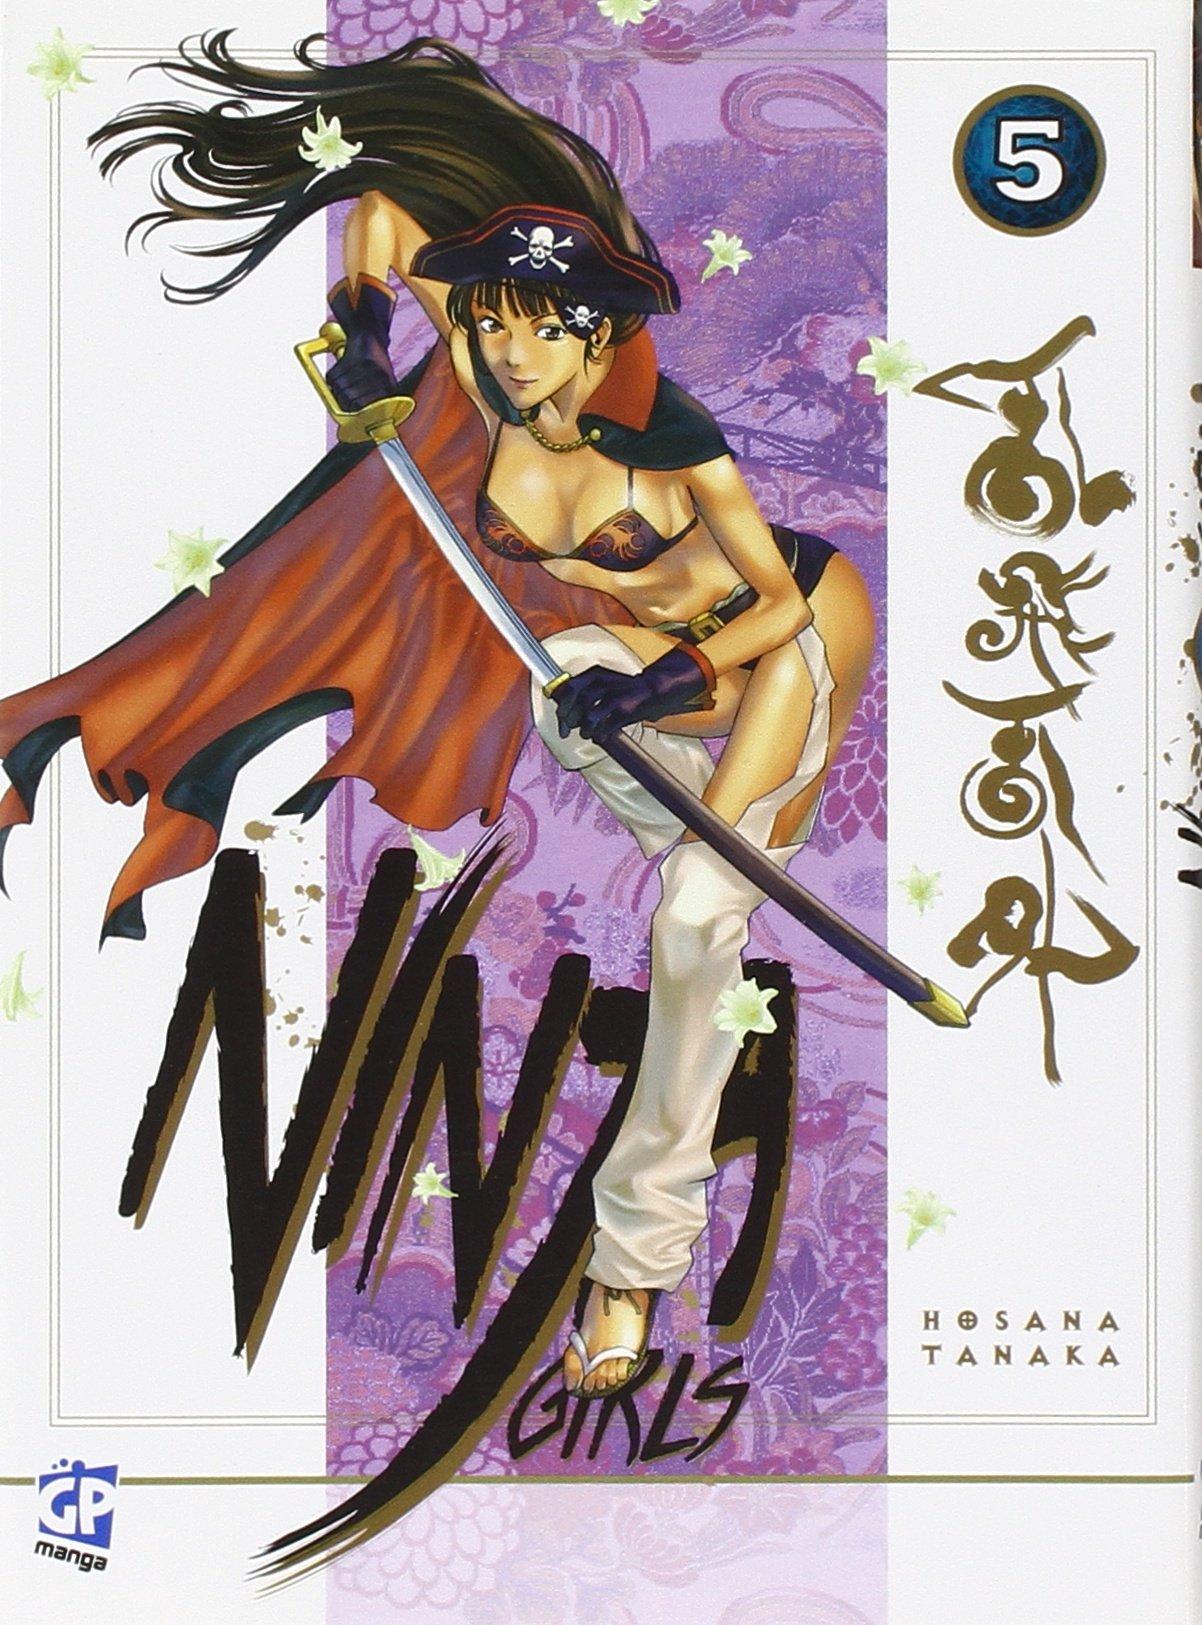 Ninja girls: 5: Amazon.es: Hosana Tanaka: Libros en idiomas ...